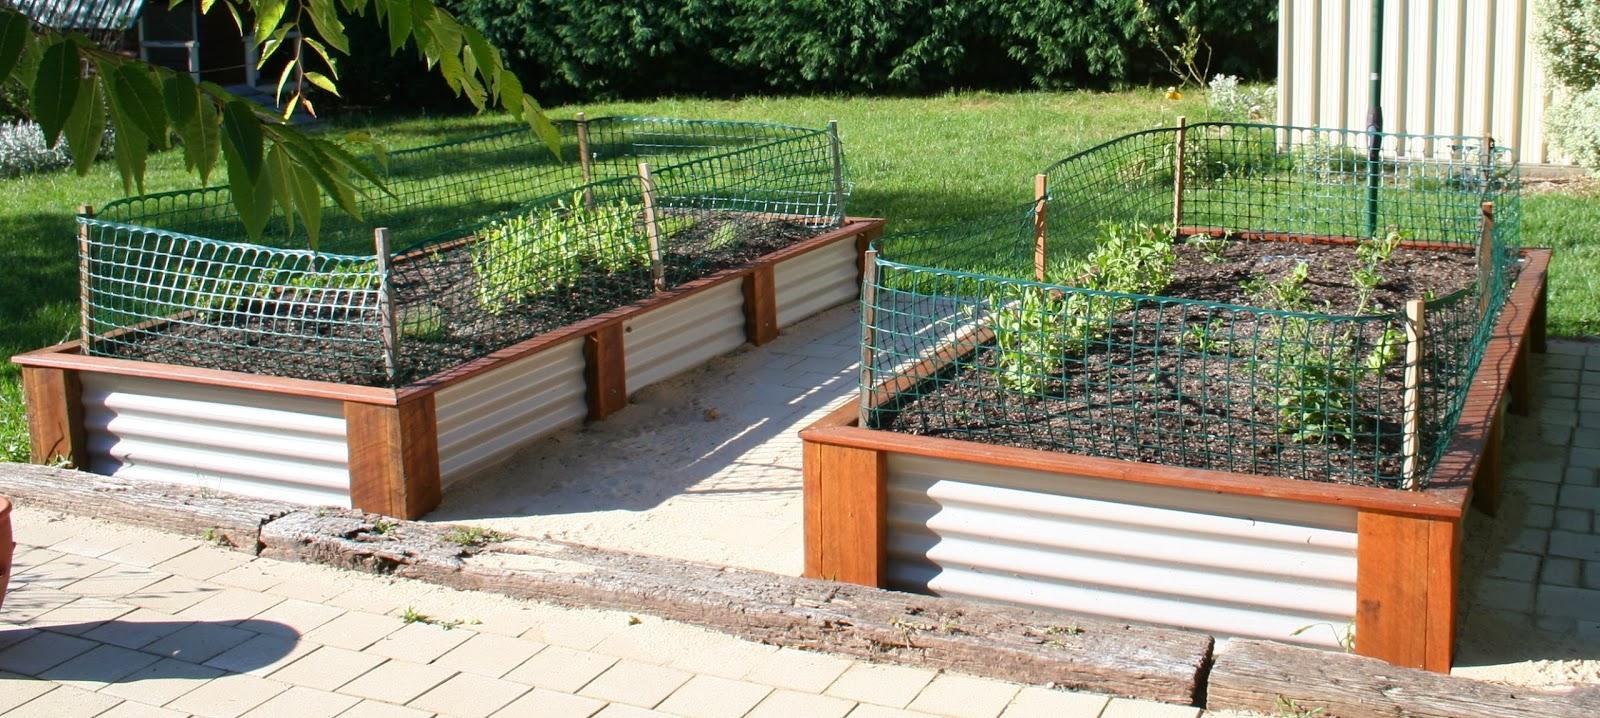 Building Raised Garden Beds On Easement